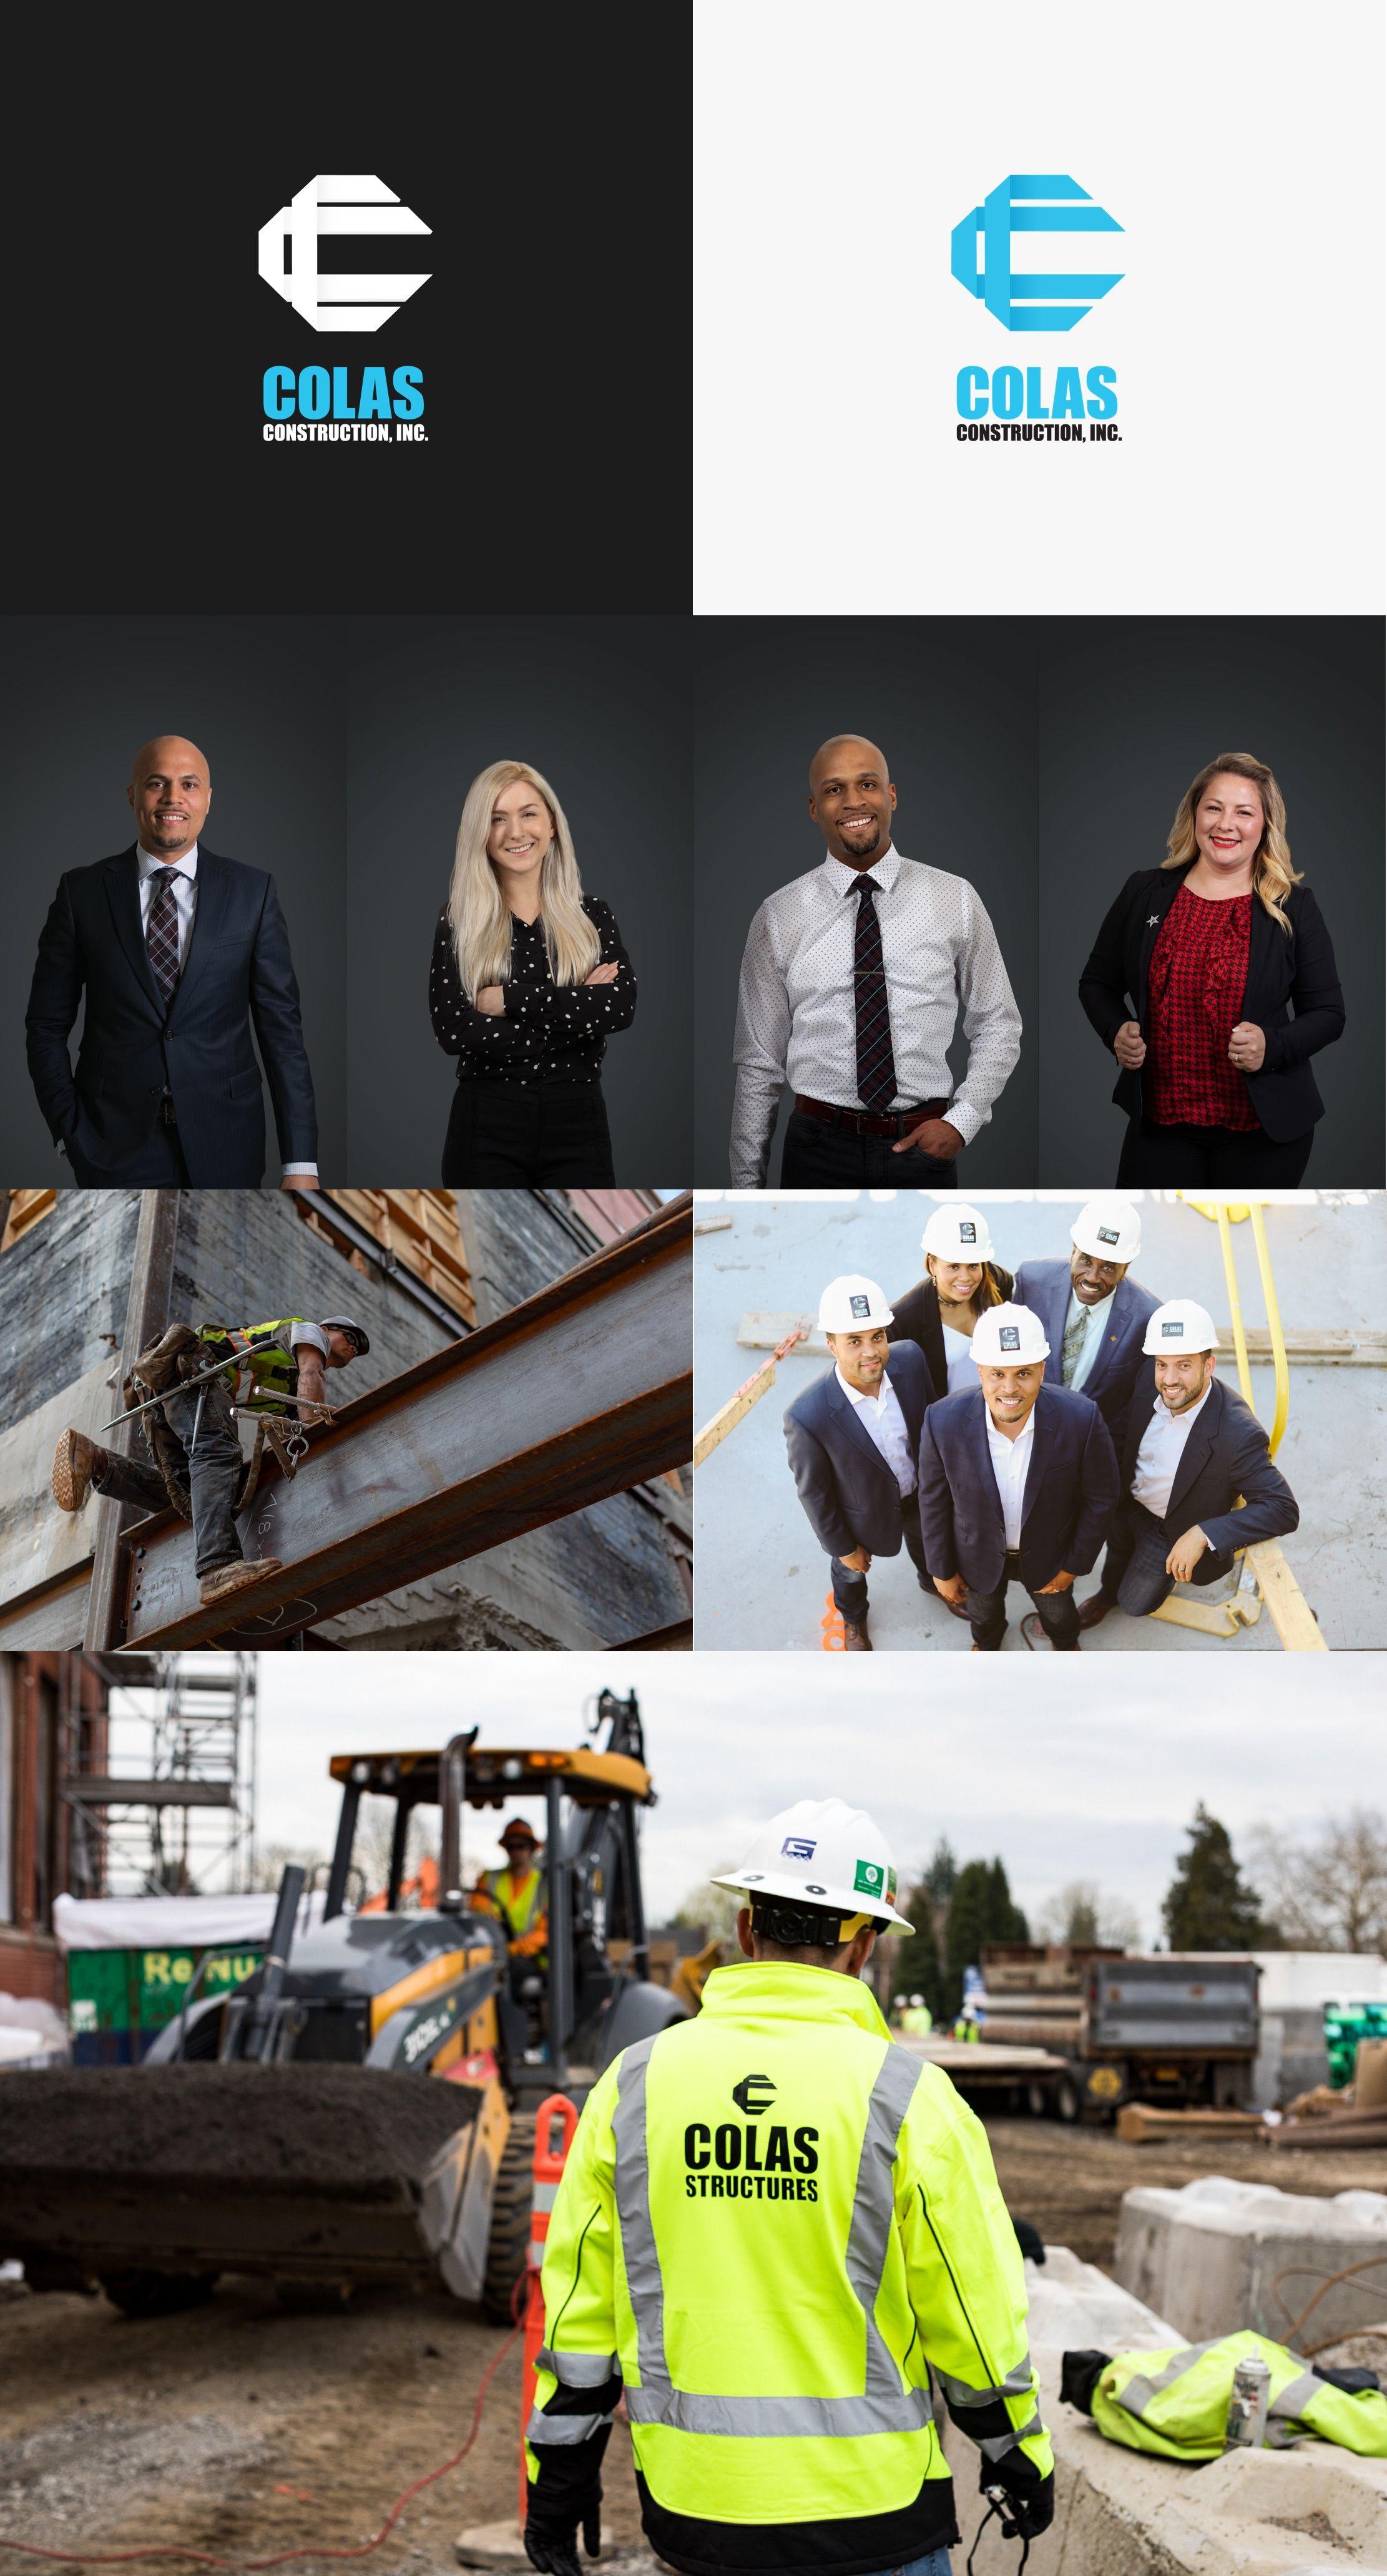 Colas Construction - Identity